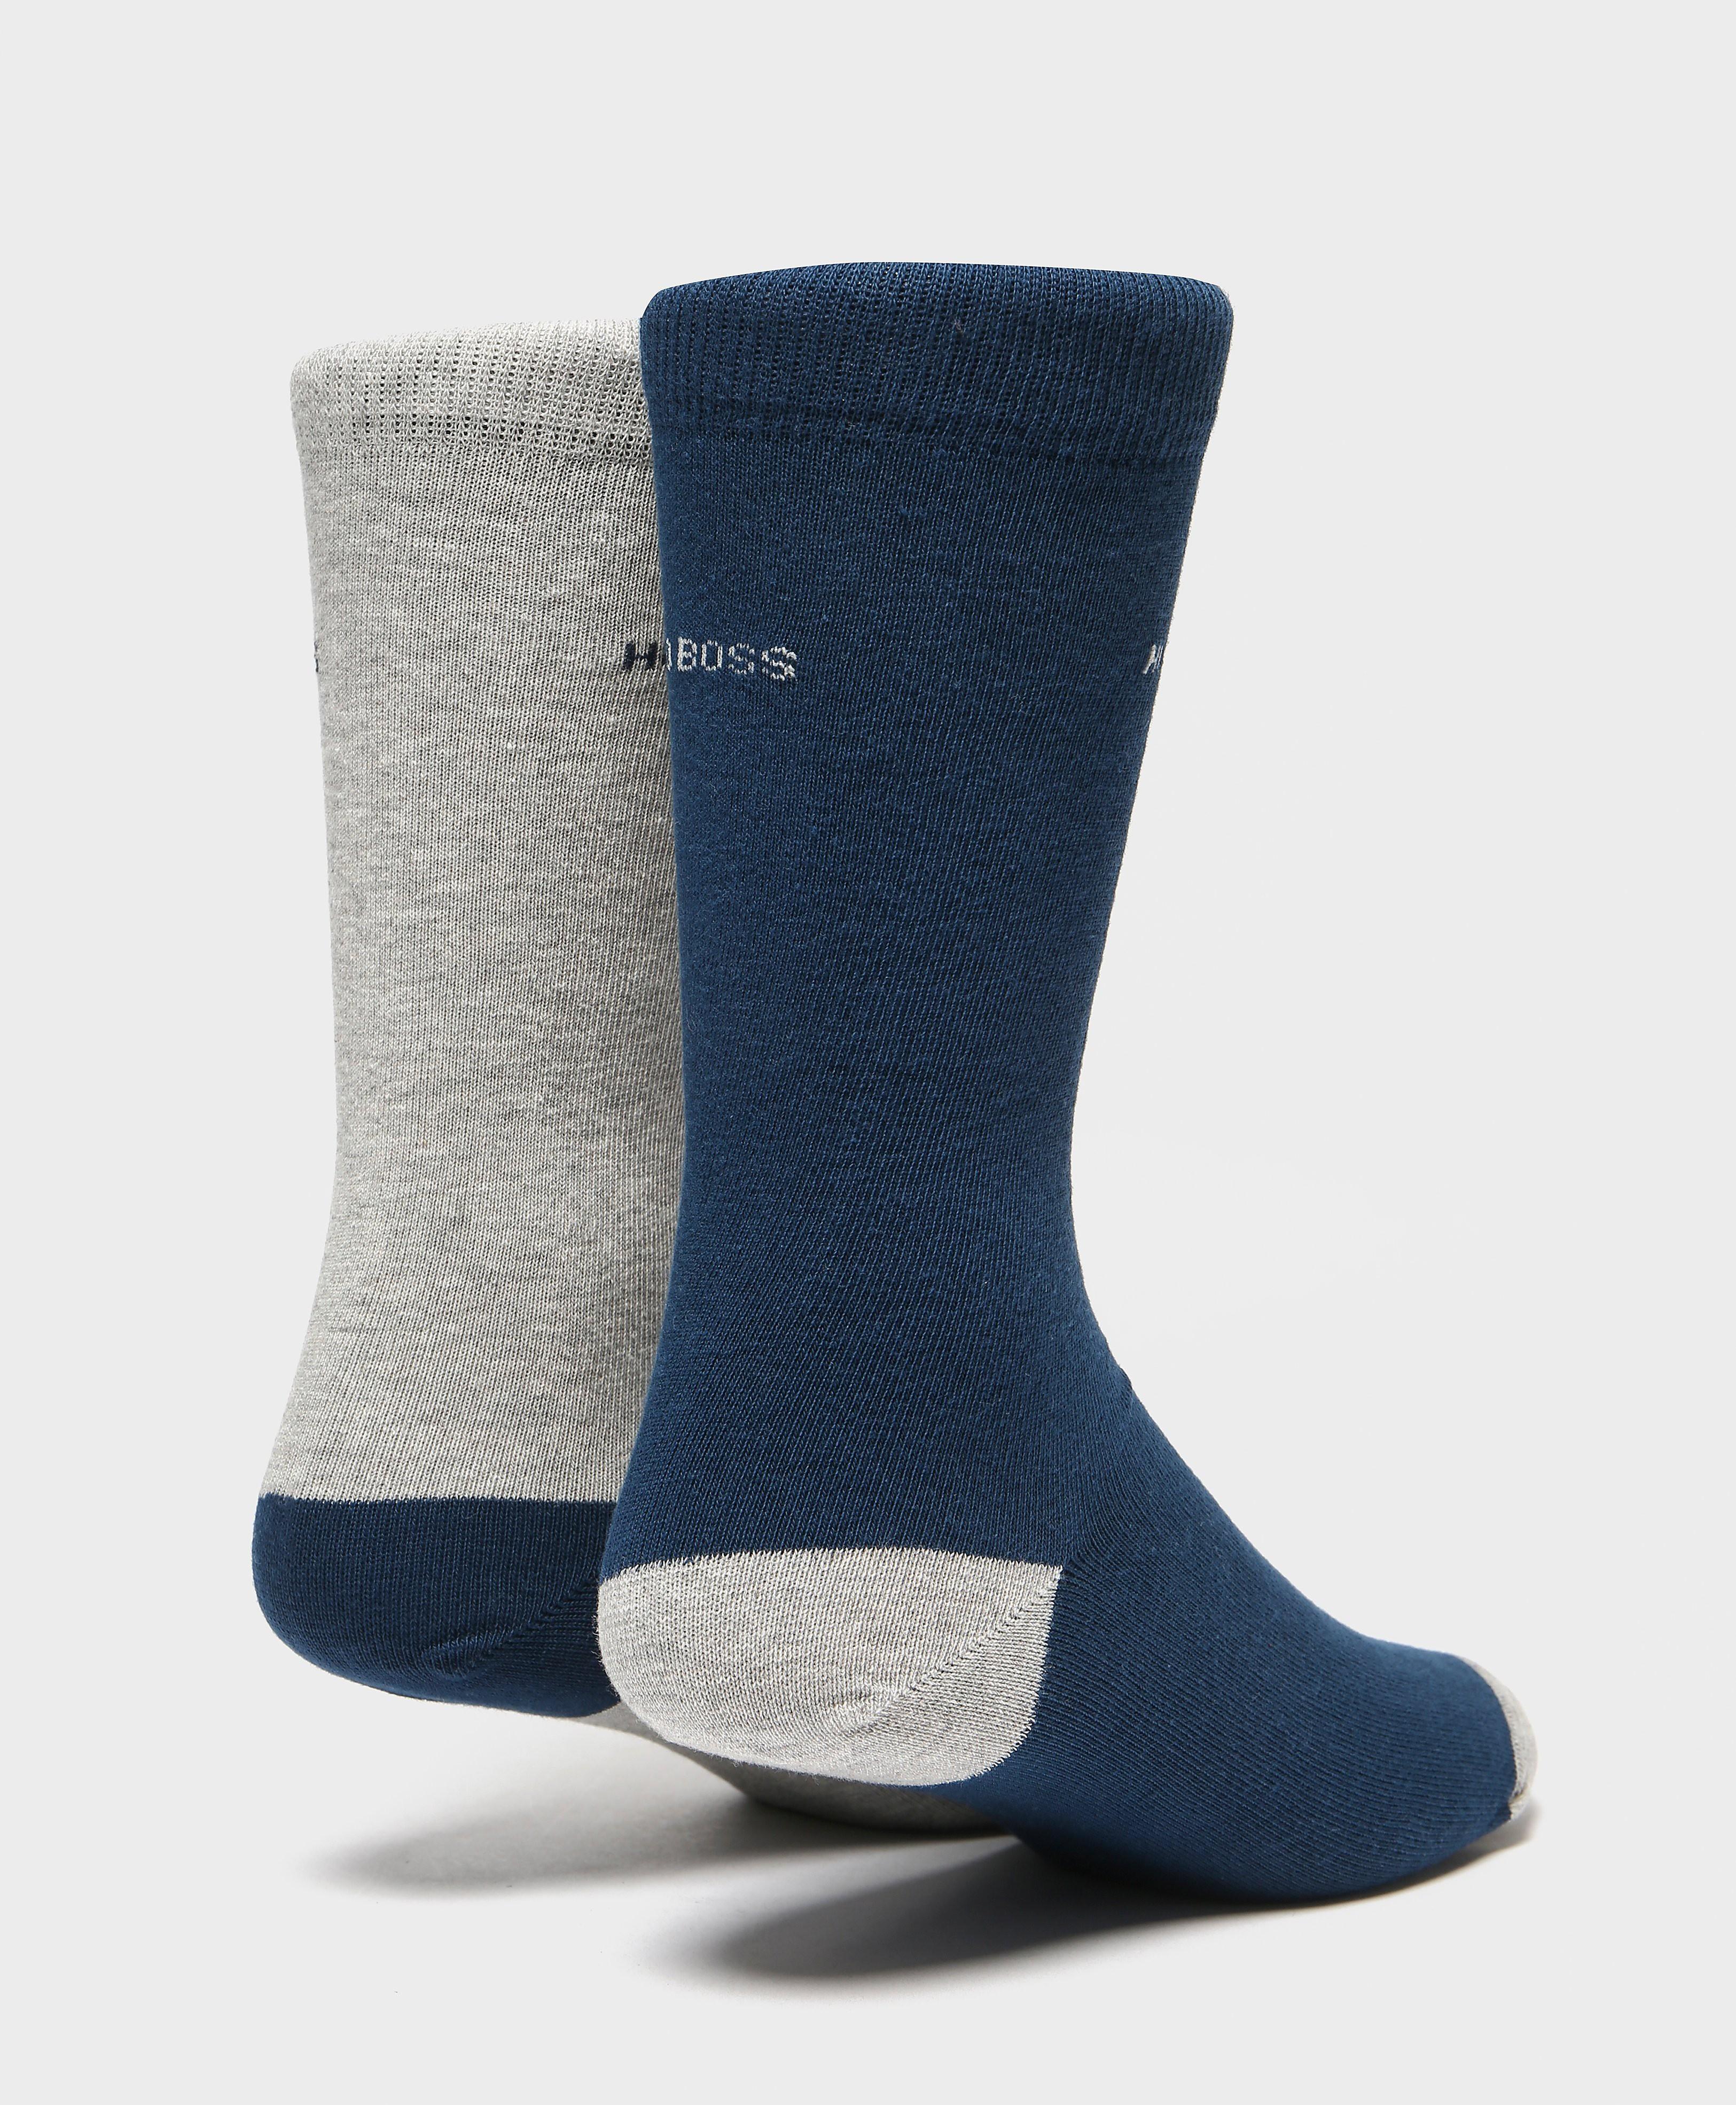 BOSS 2-Pack Heel Toe Socks